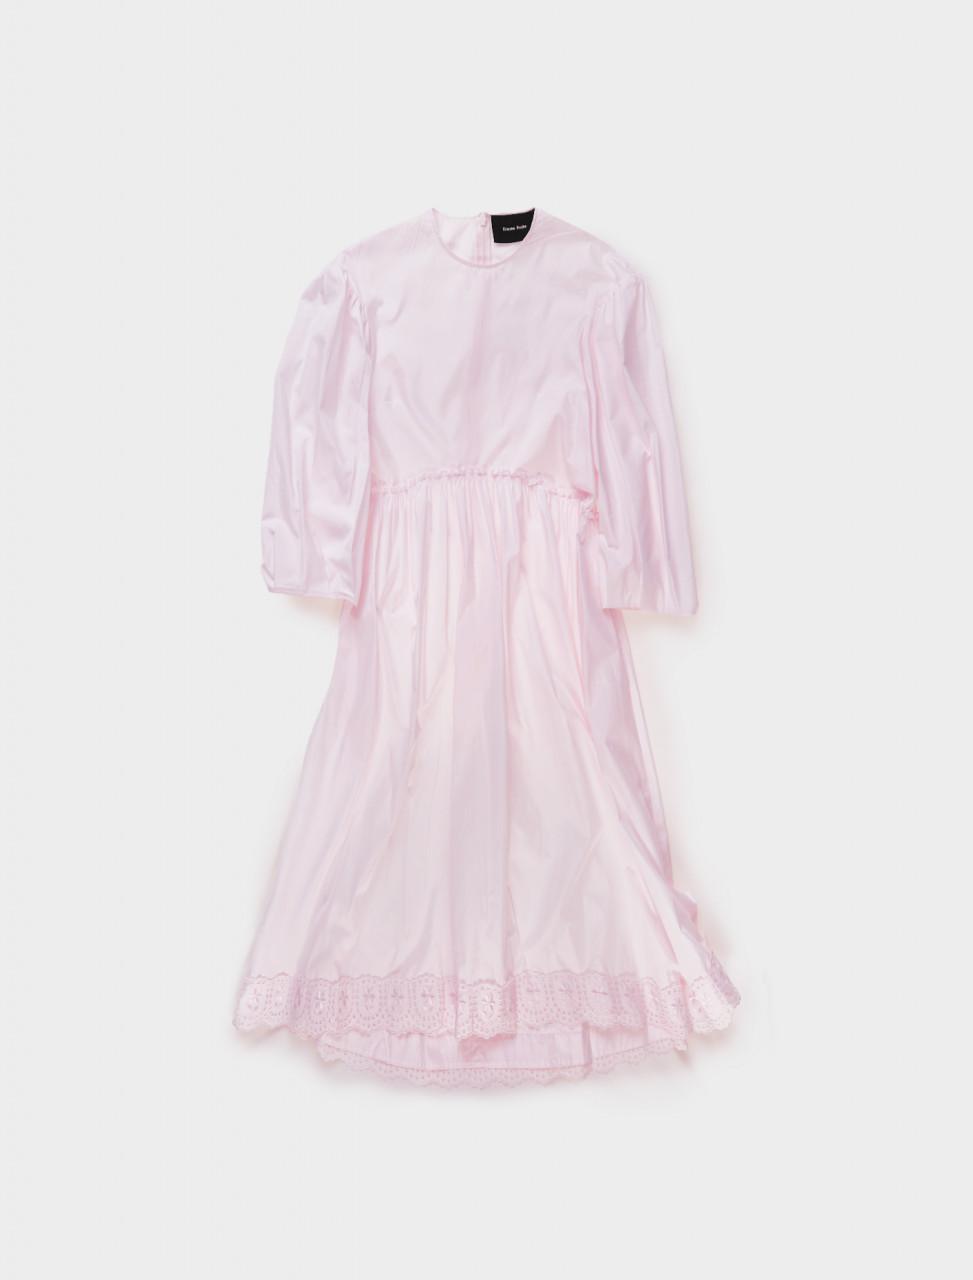 Simone Rocha Pink Smock Dress Front